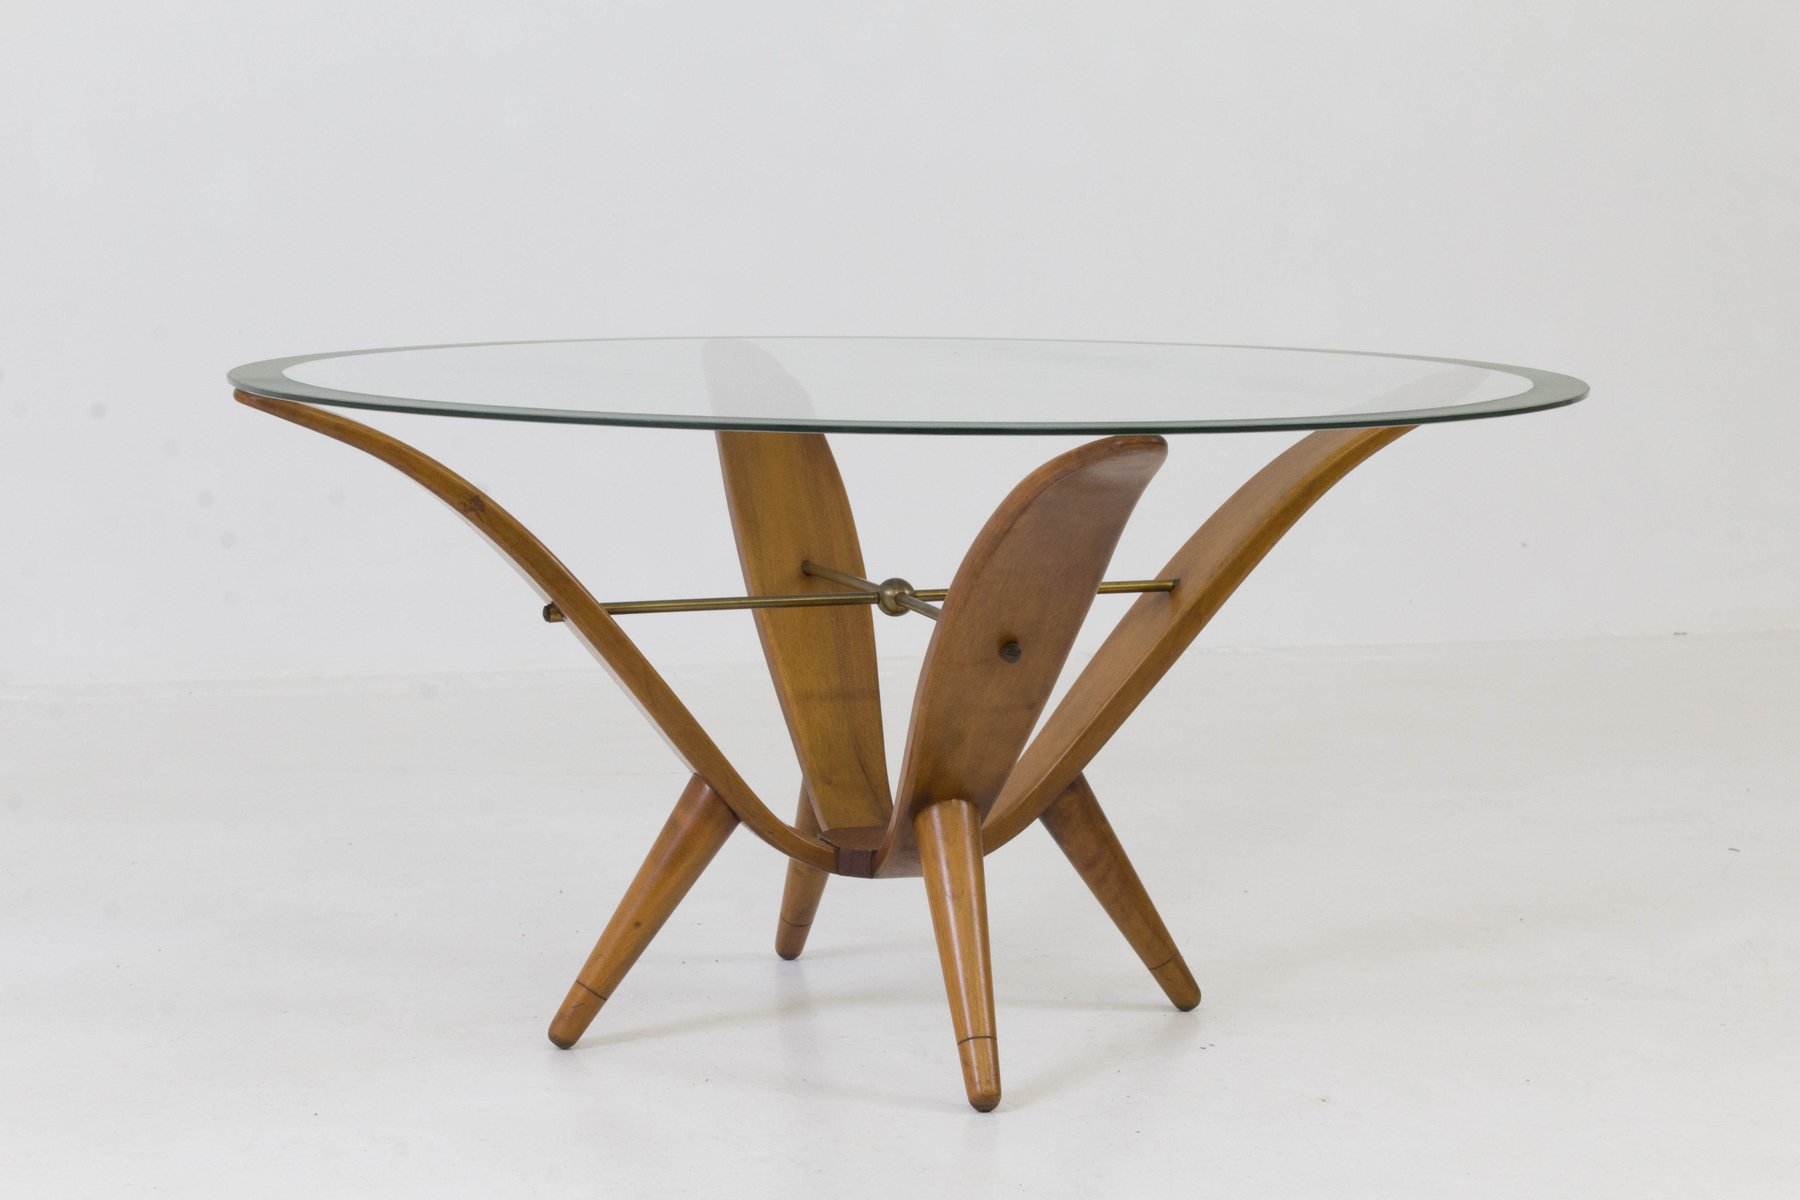 Italian Mid Century Modern Coffee Table, 1950s